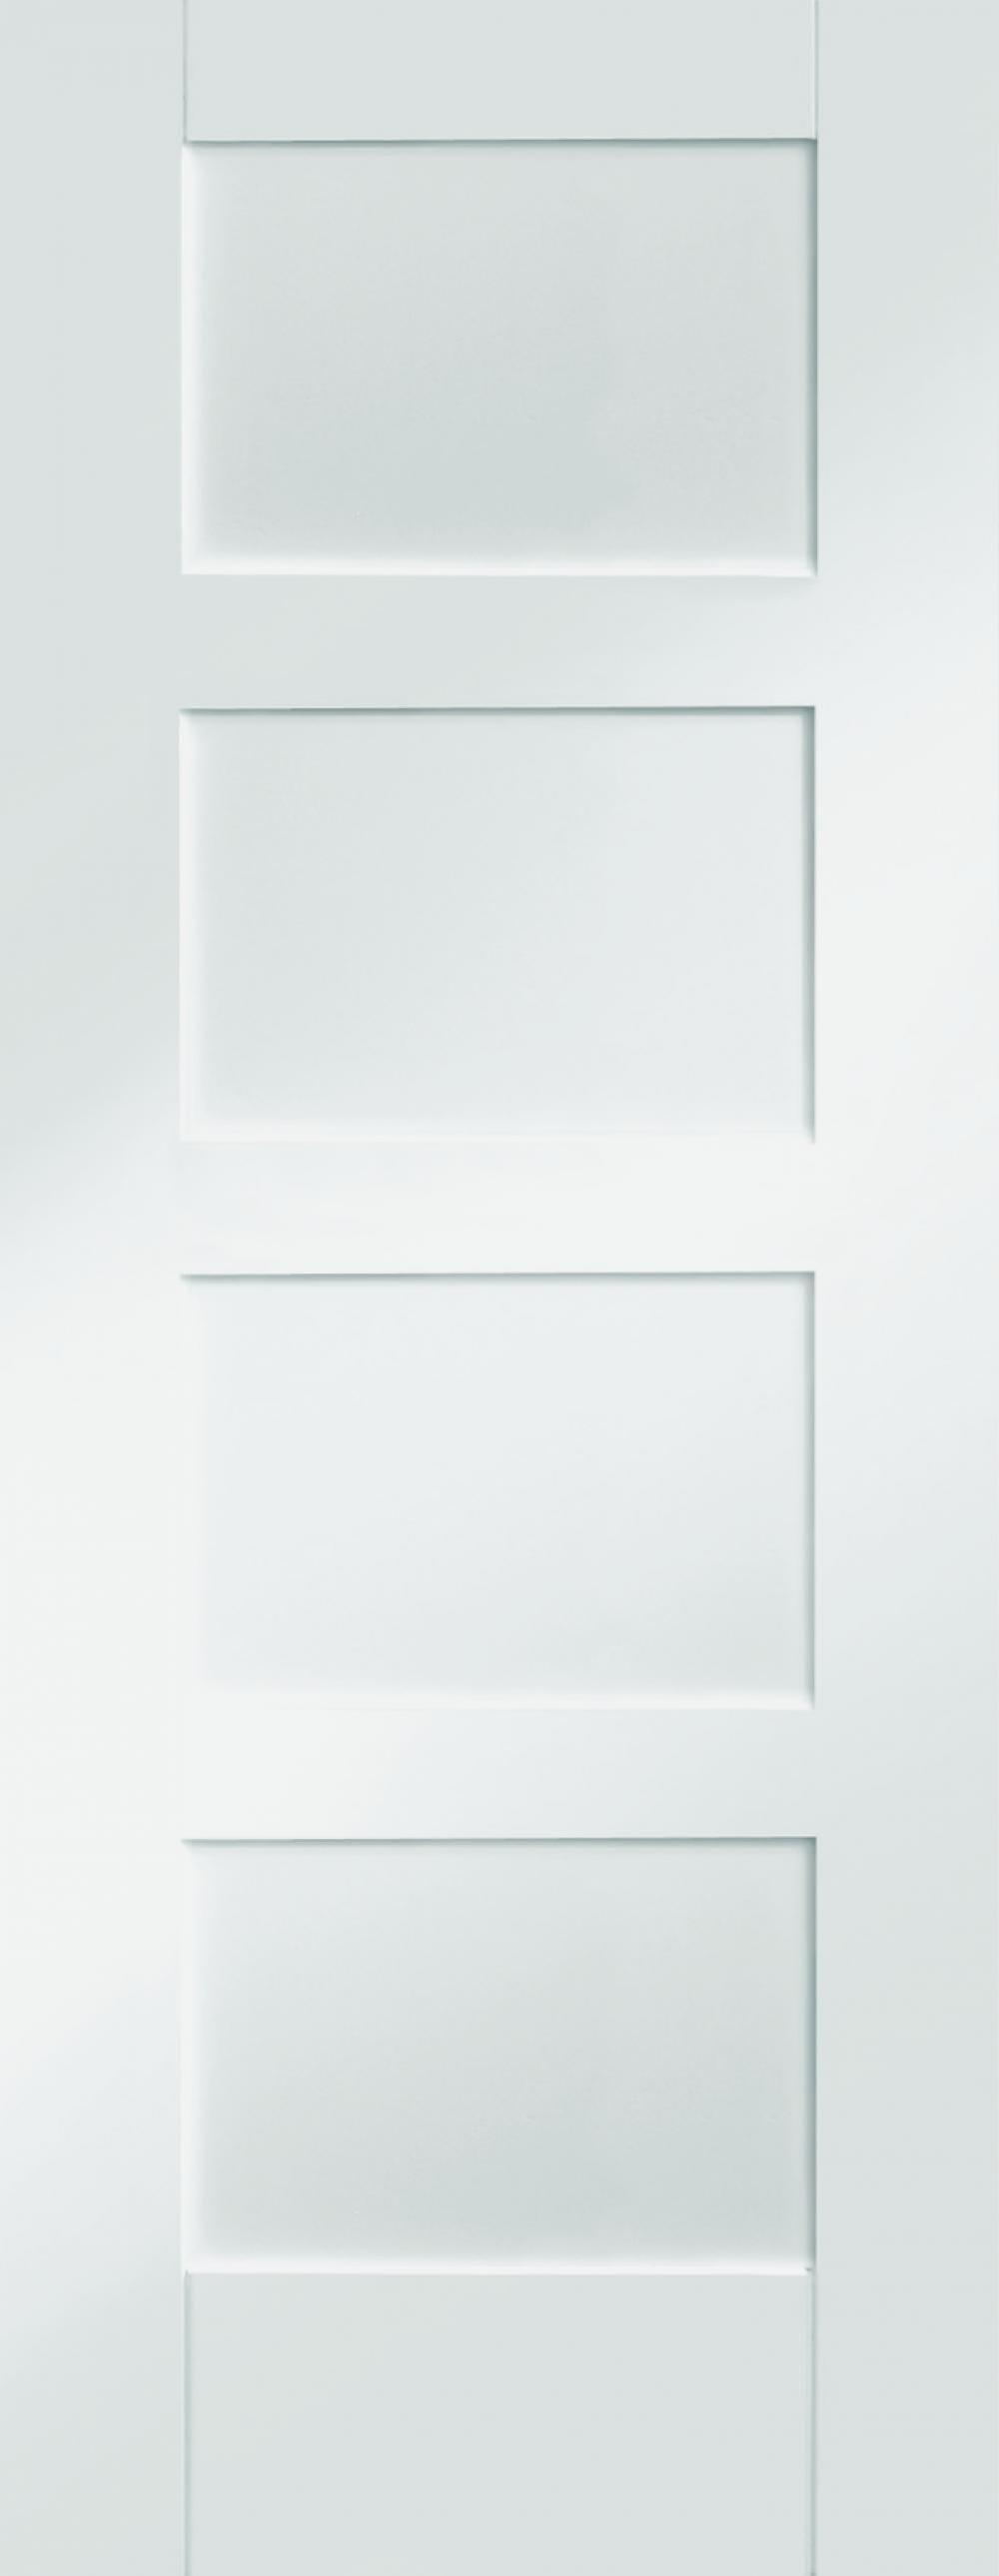 4 Panel White Shaker Image